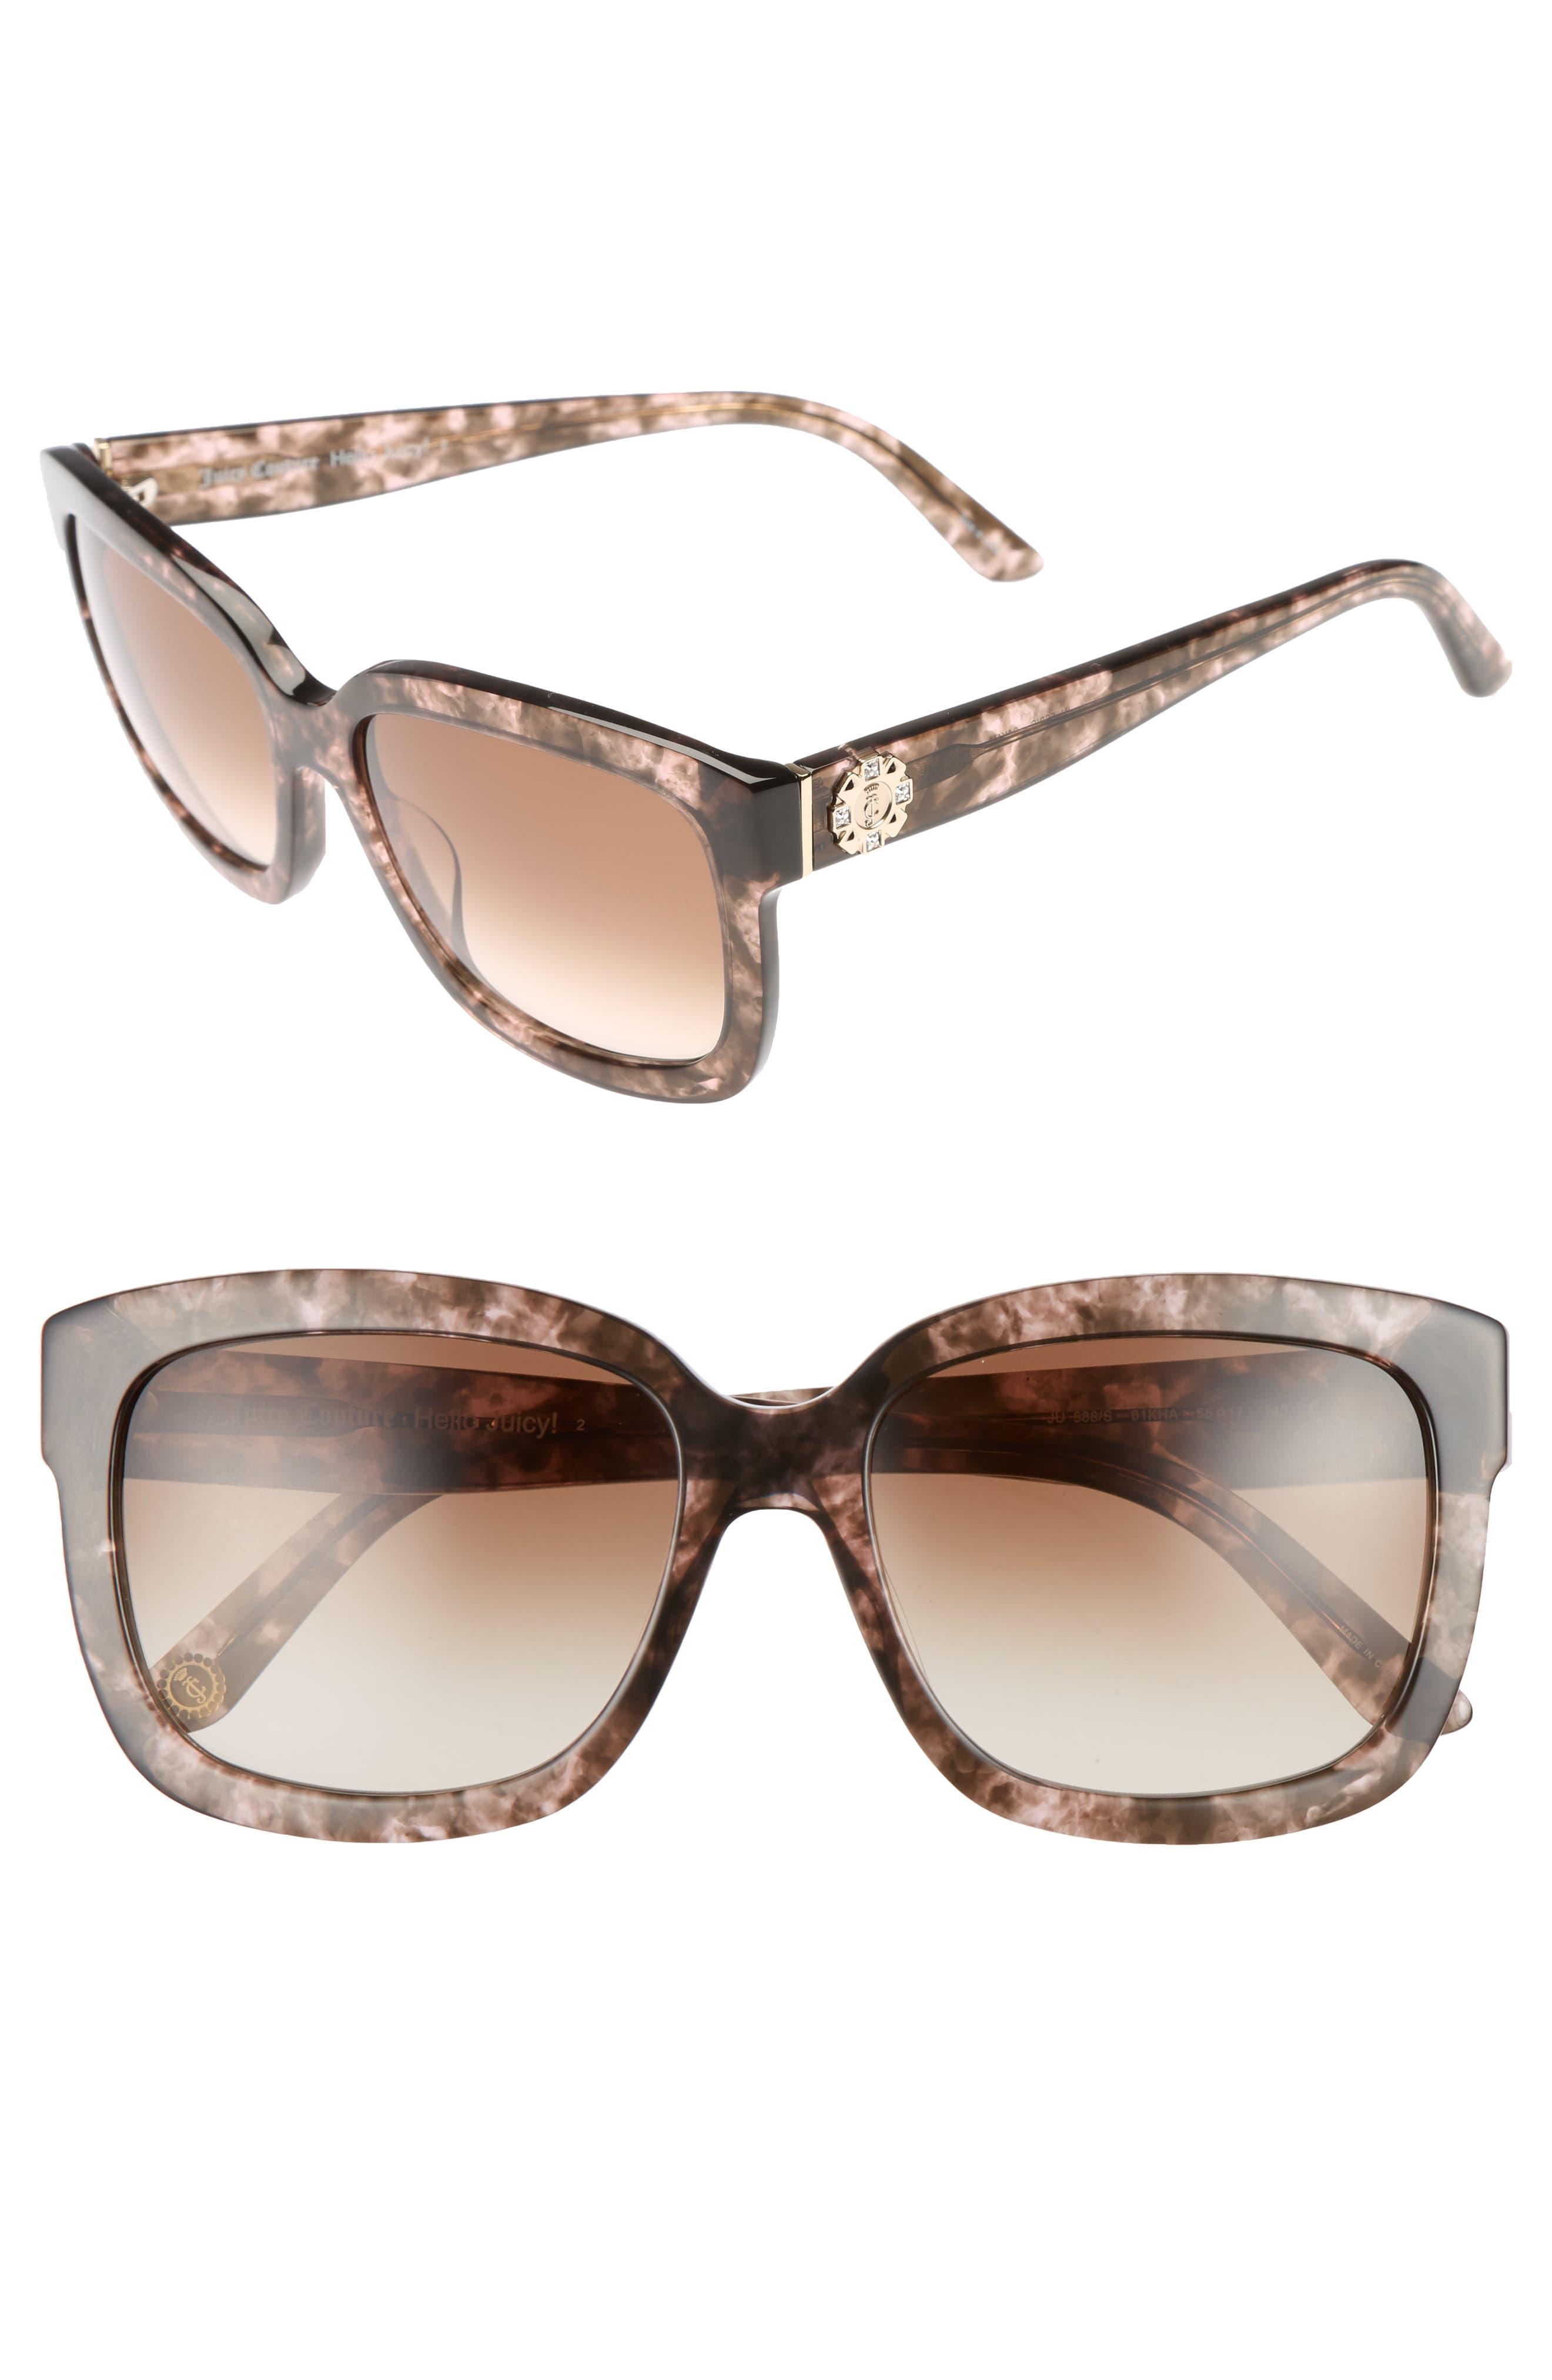 Black Label 55mm Square Sunglasses,                         Main,                         color, 210